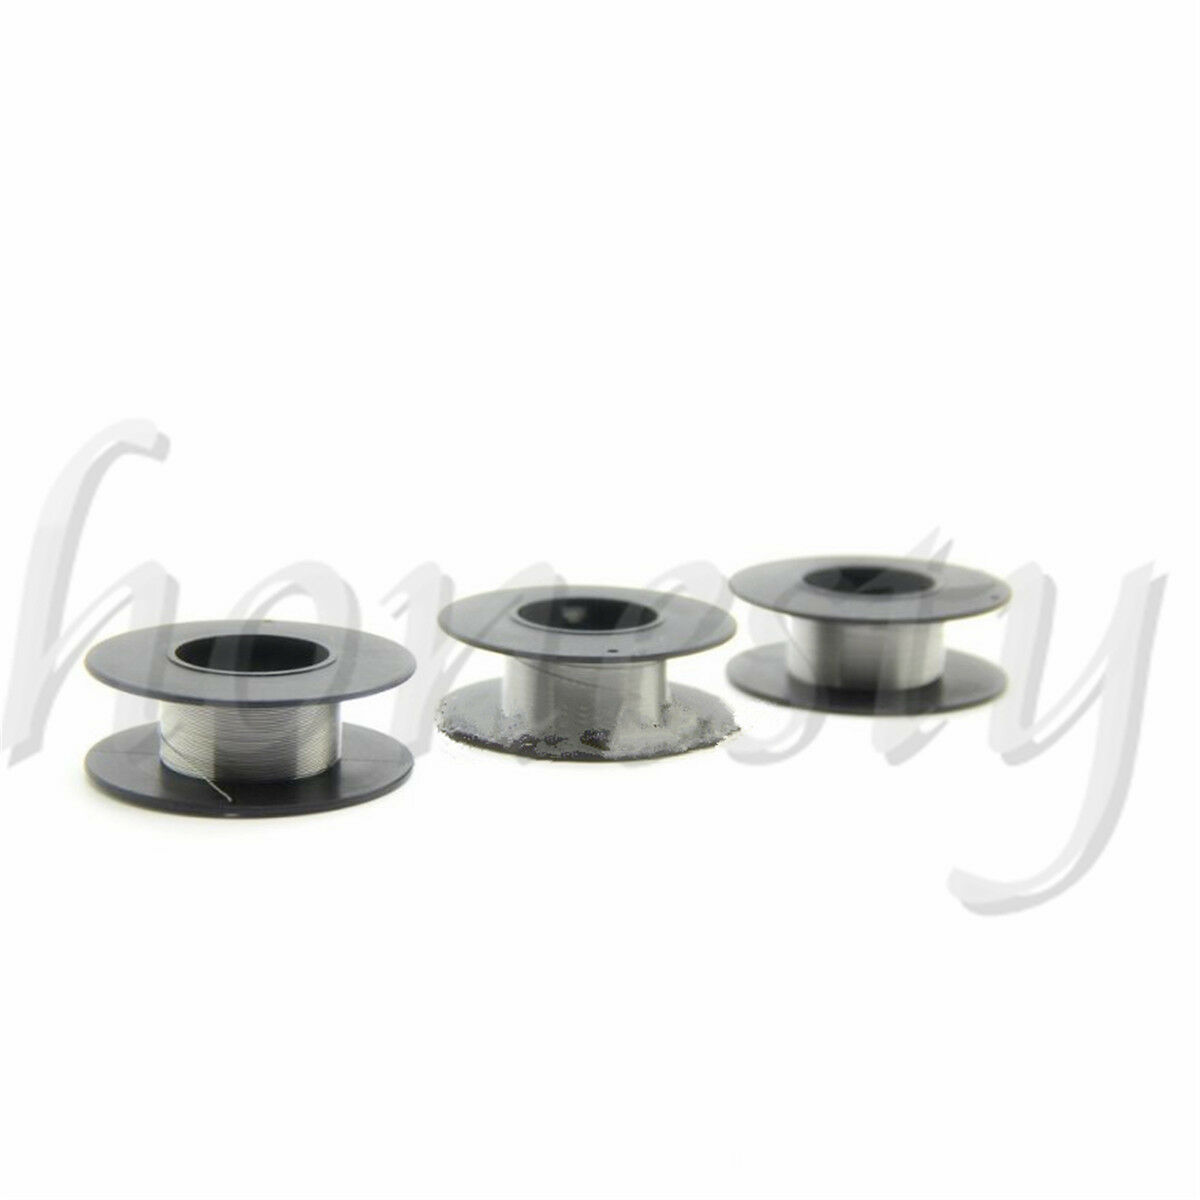 3pcs Nichrome Wire 2080 0.3mm Kanthal A1 Cantal 10m Resistance ...